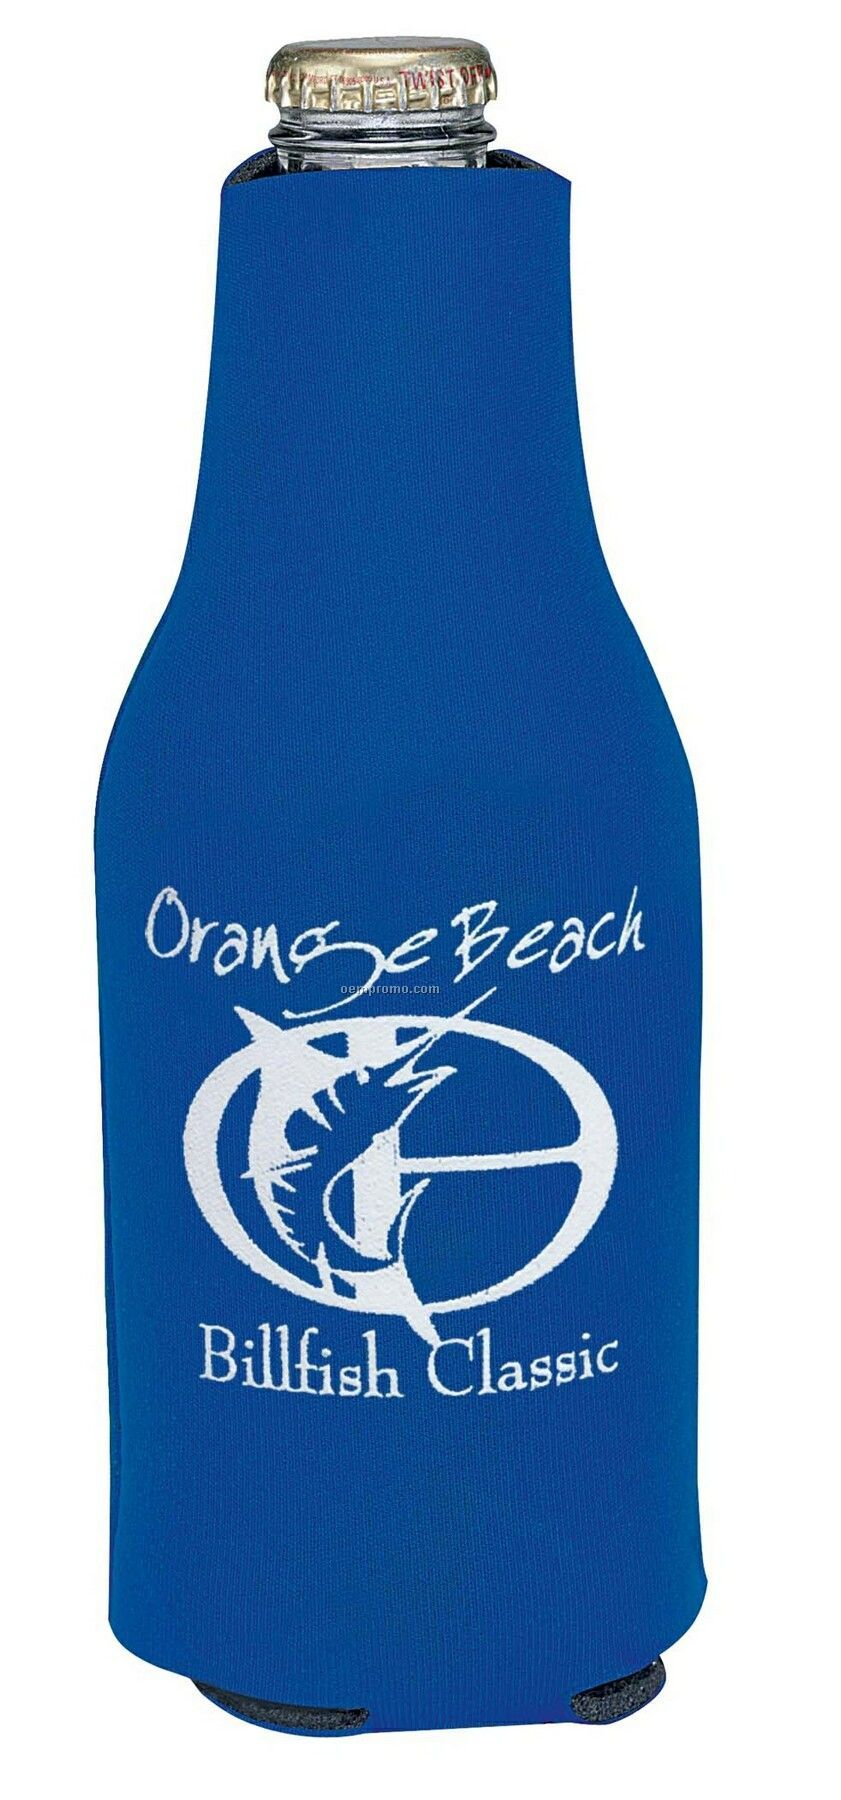 Rcc Koozie Zip-up Bottle Koozie Kooler